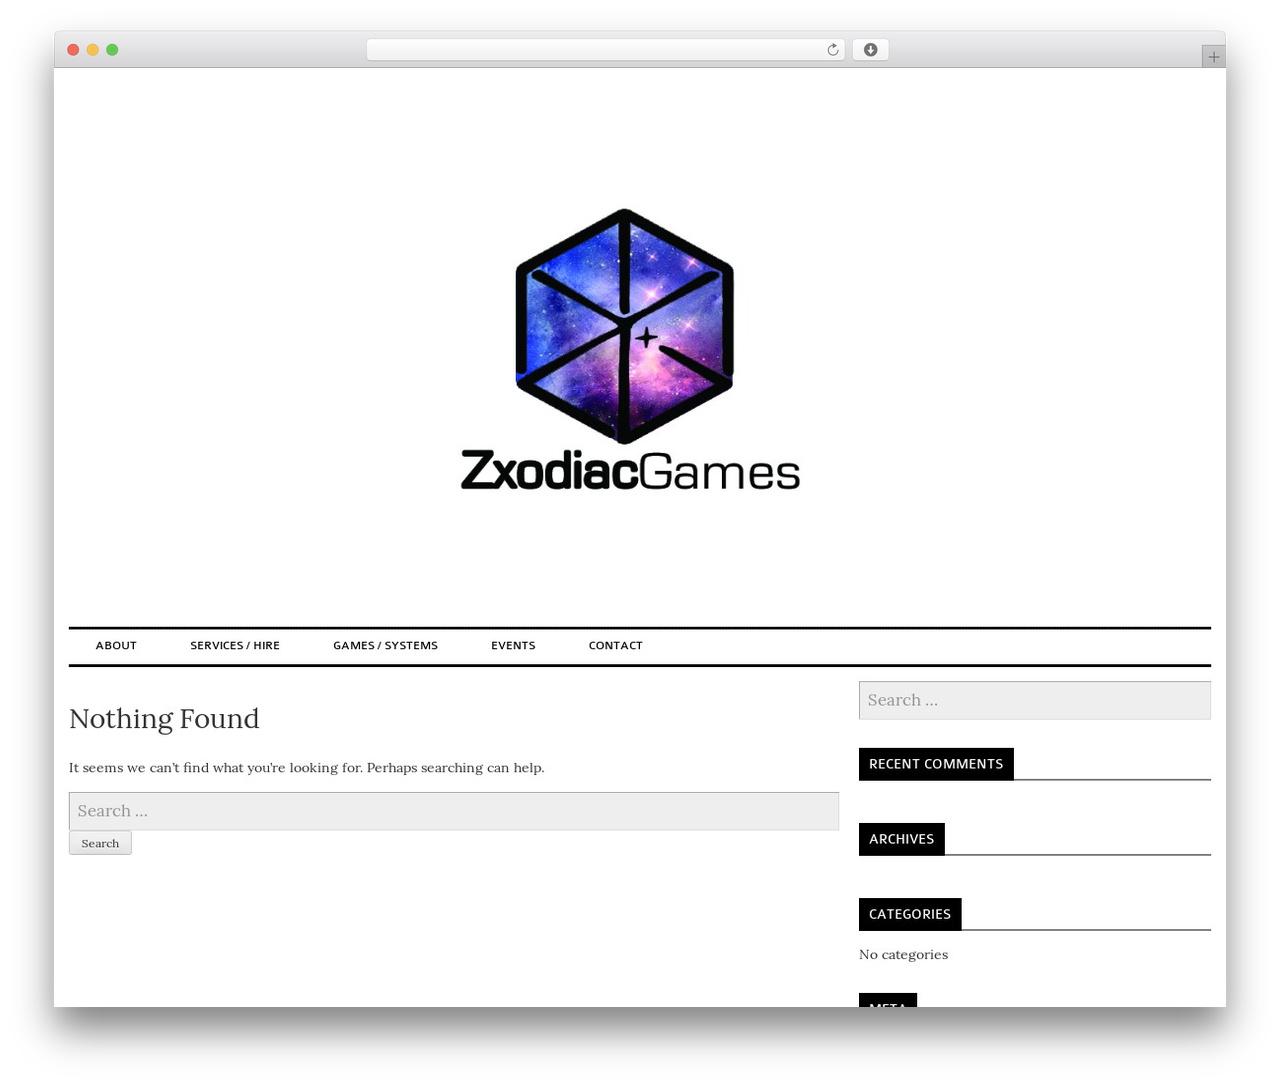 laveo free WP theme - zxodiacgames.com